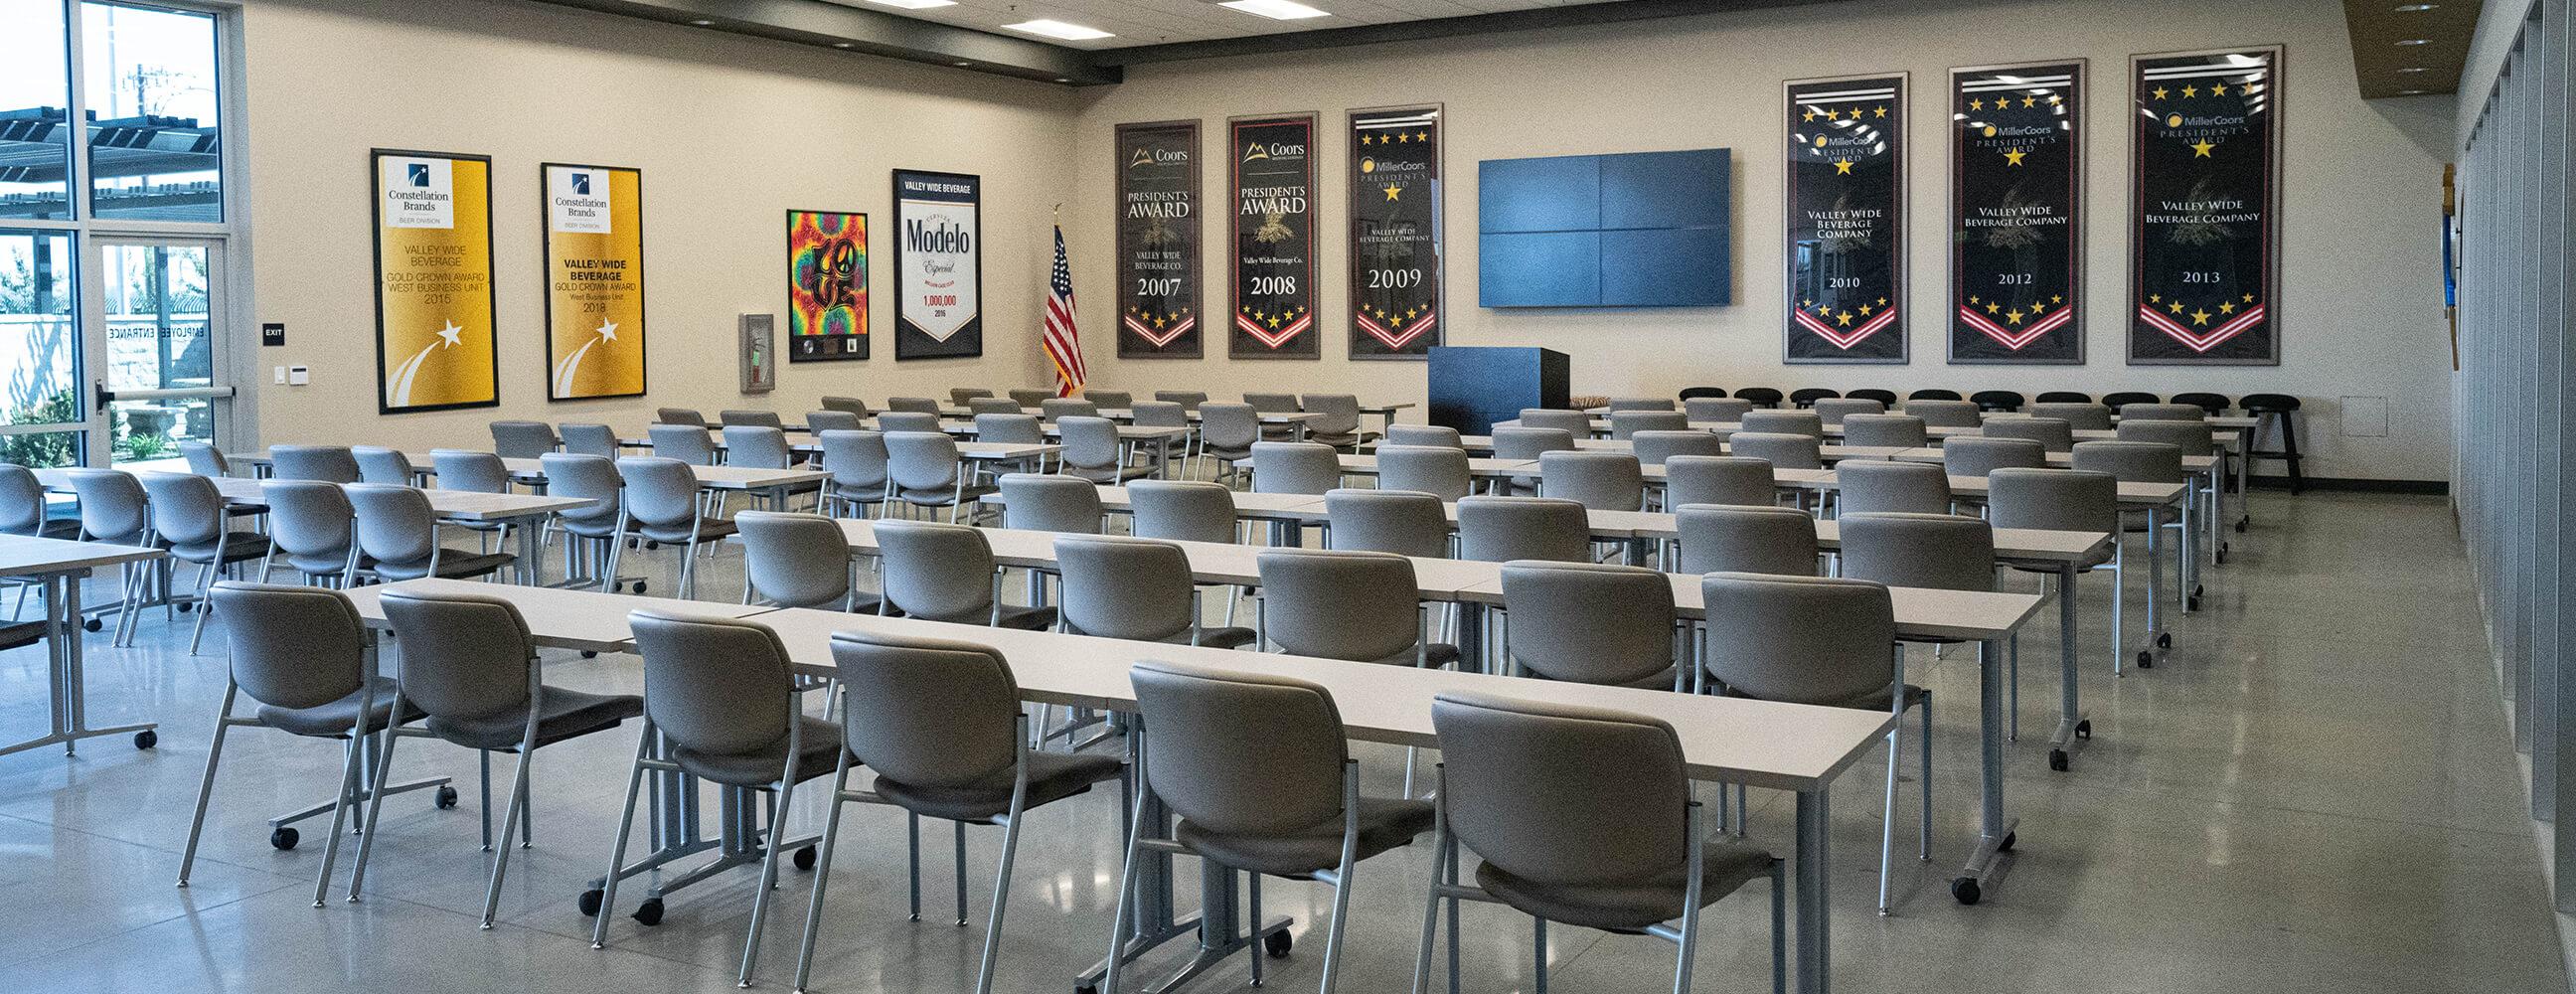 Valley Wide Beverage large conference room